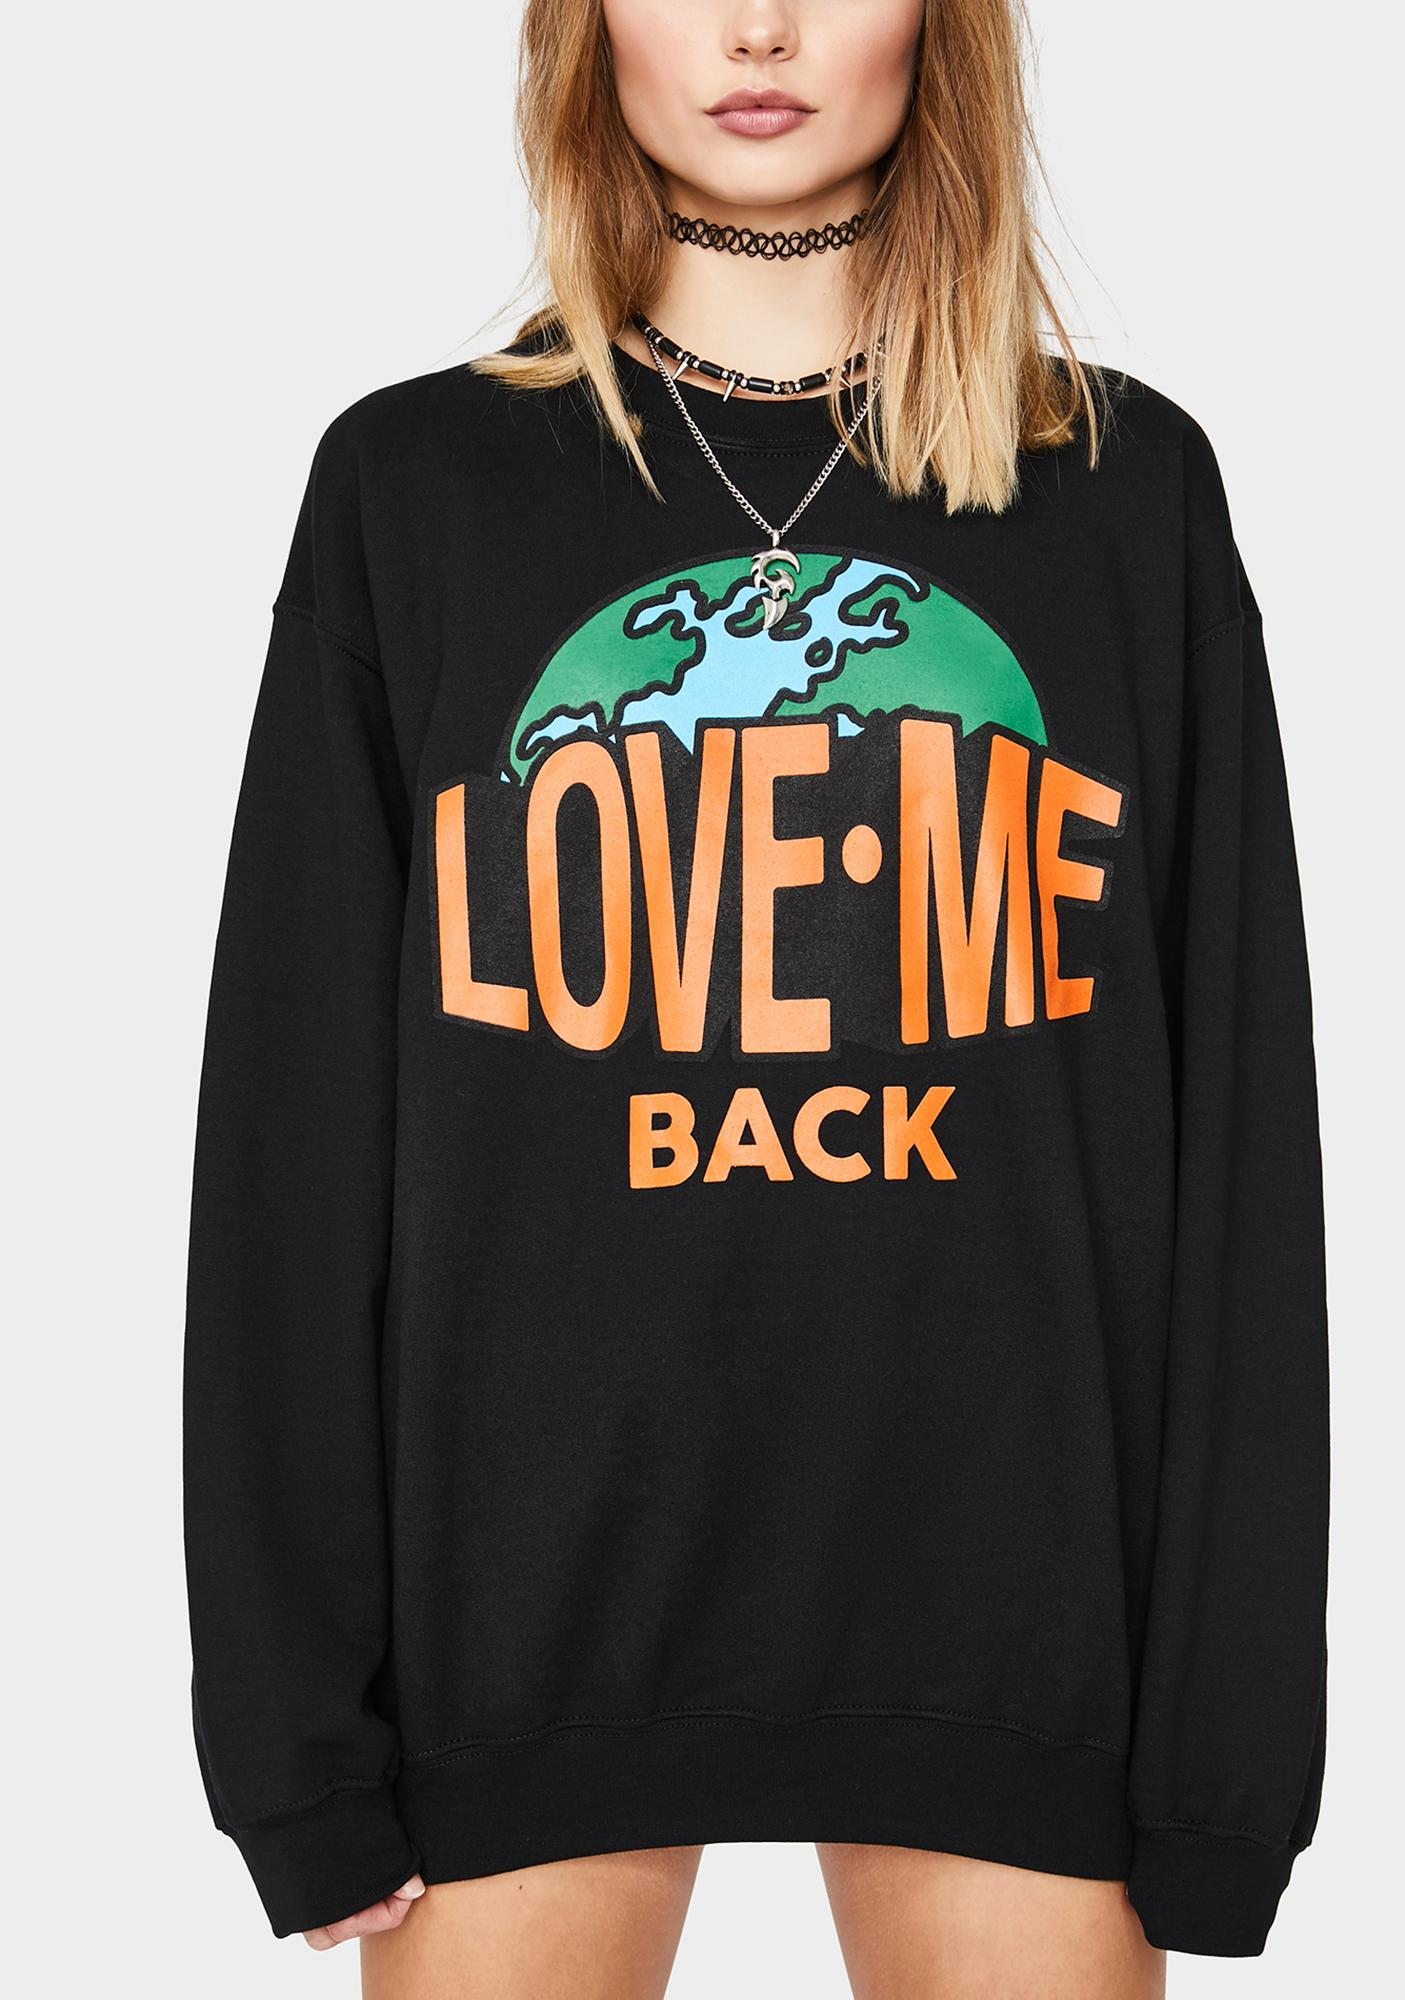 Petals and Peacocks Love Me Back Crewneck Sweatshirt